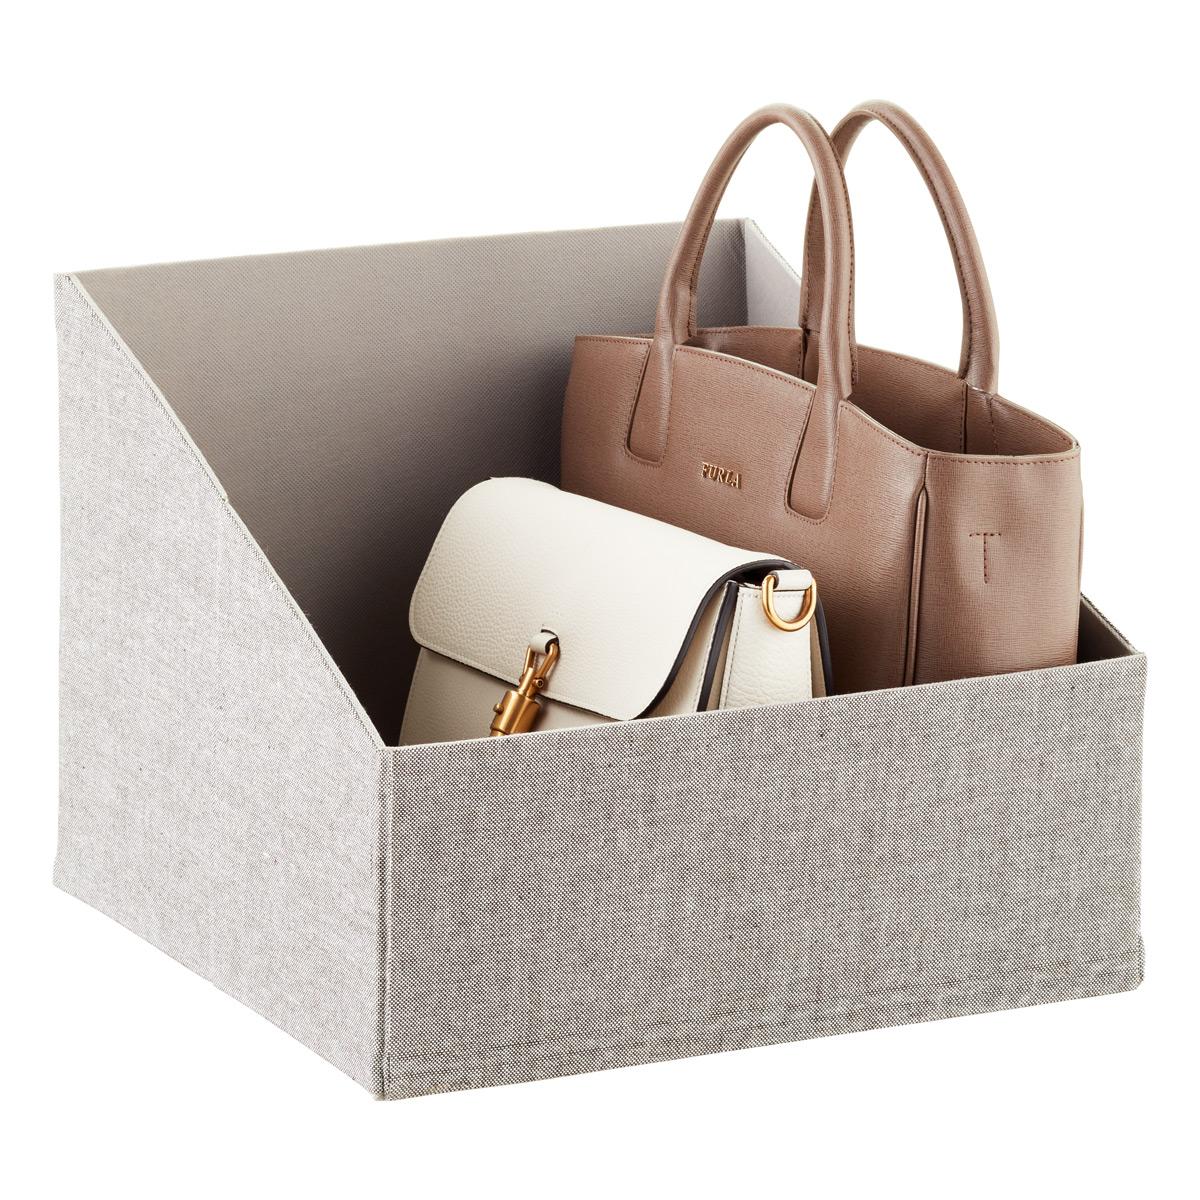 How To Maximize A Small Closet. Handbag Storage Bin Grey